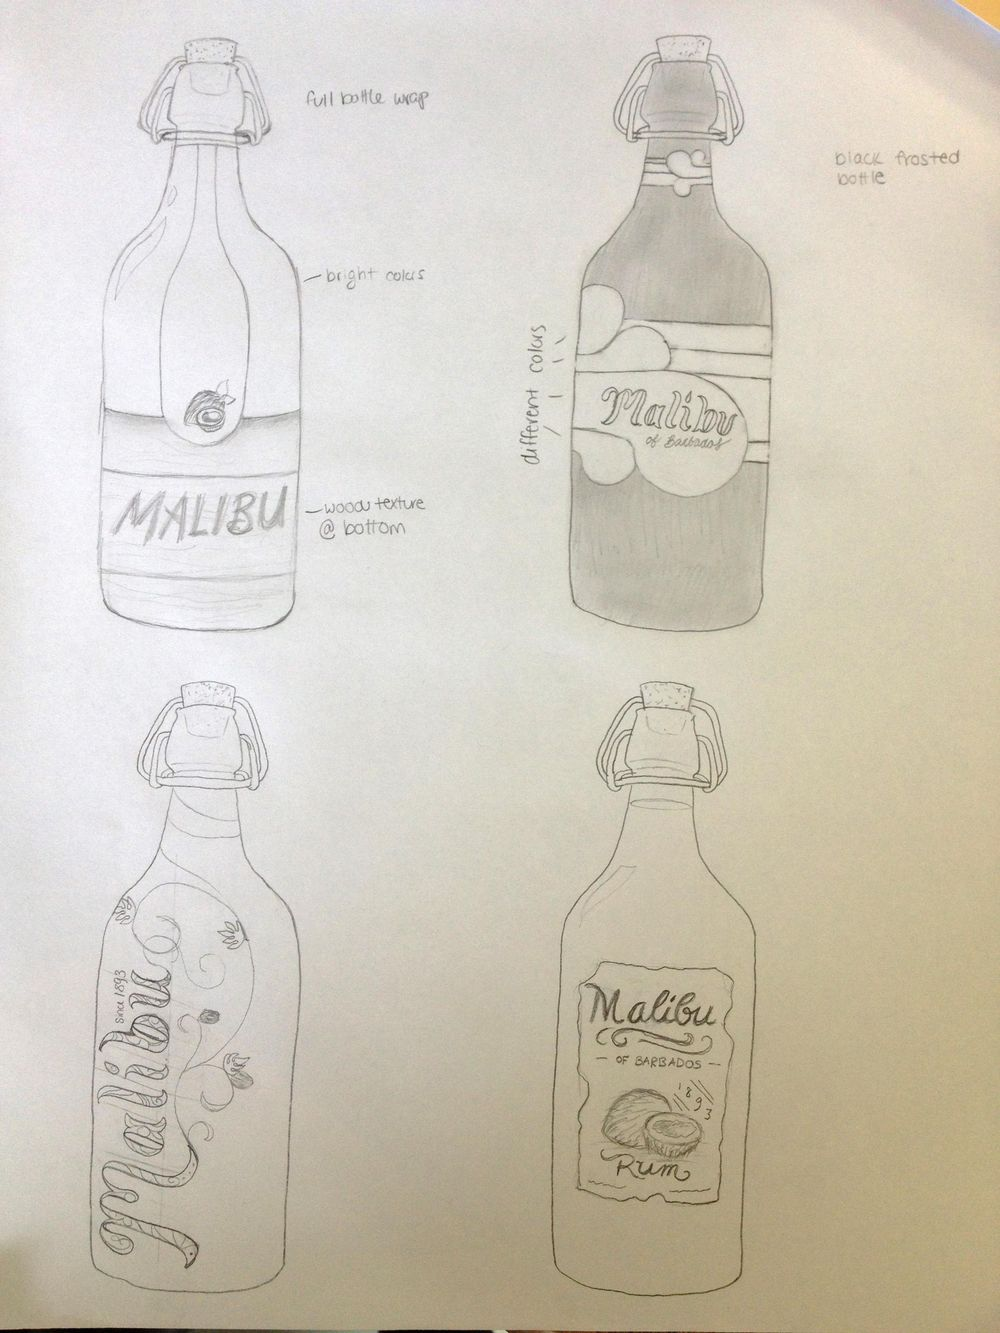 Malibu Rum - image 6 - student project